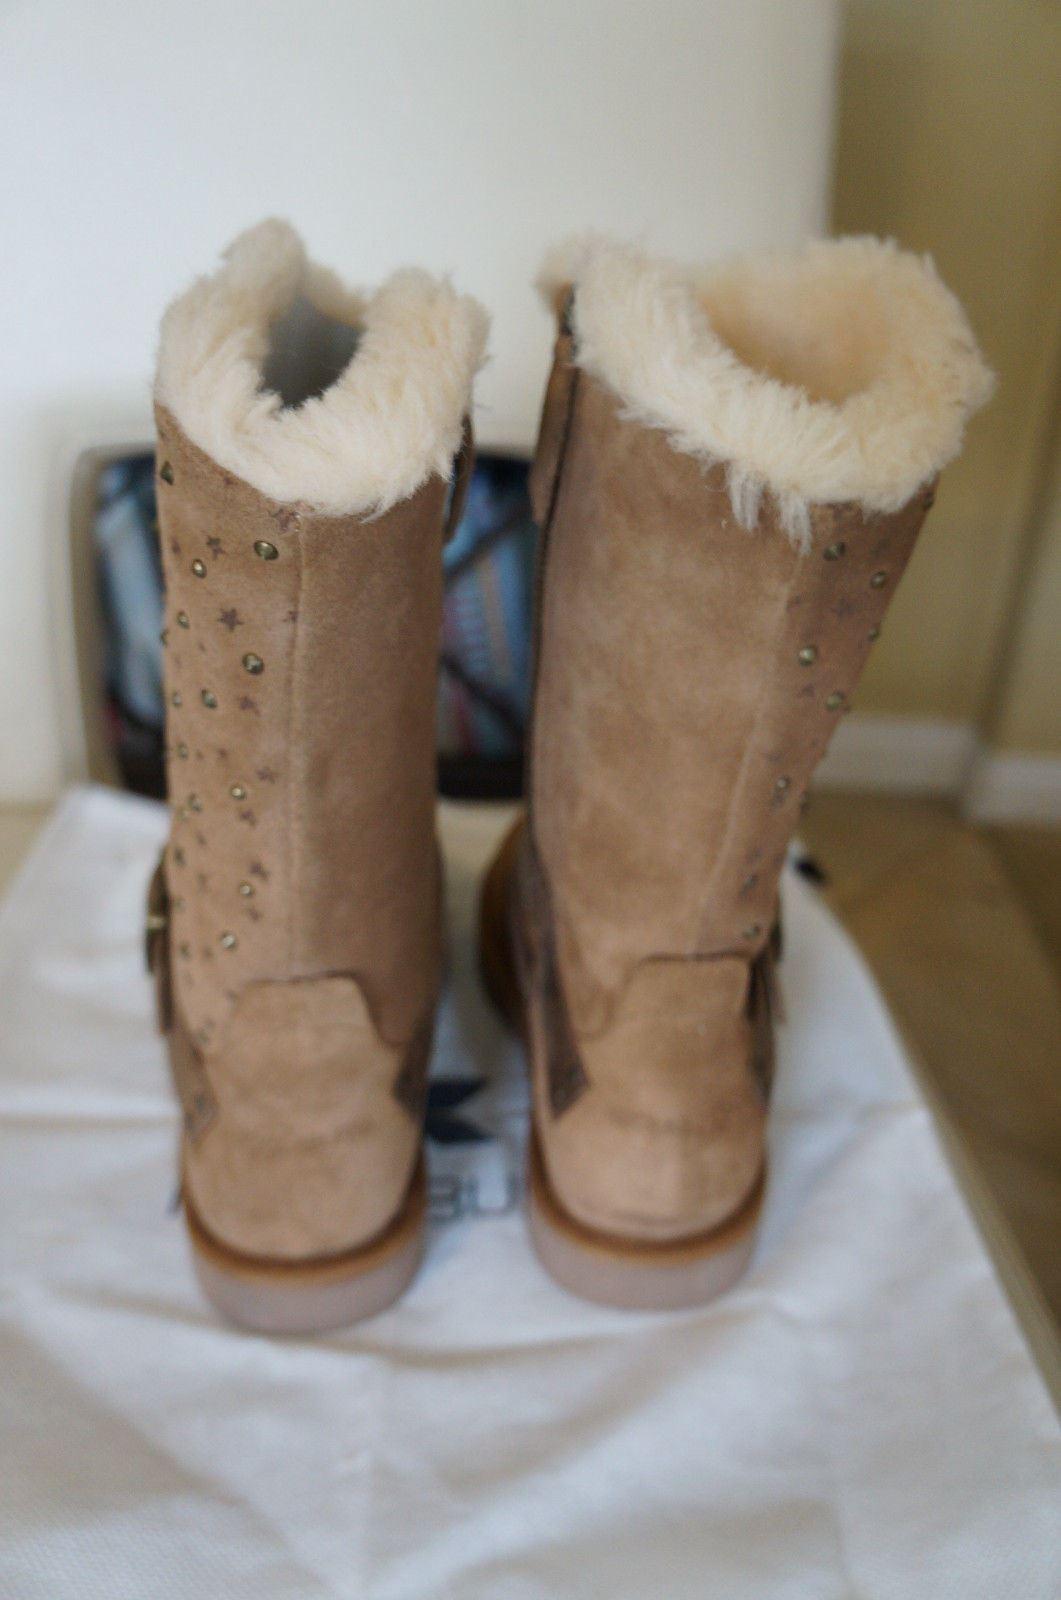 NEW KOOLABURRA Heidi Stardust Suede MidCalf Shearling  Stivali Chestnut SZ 7  Shearling 295 1fecf1